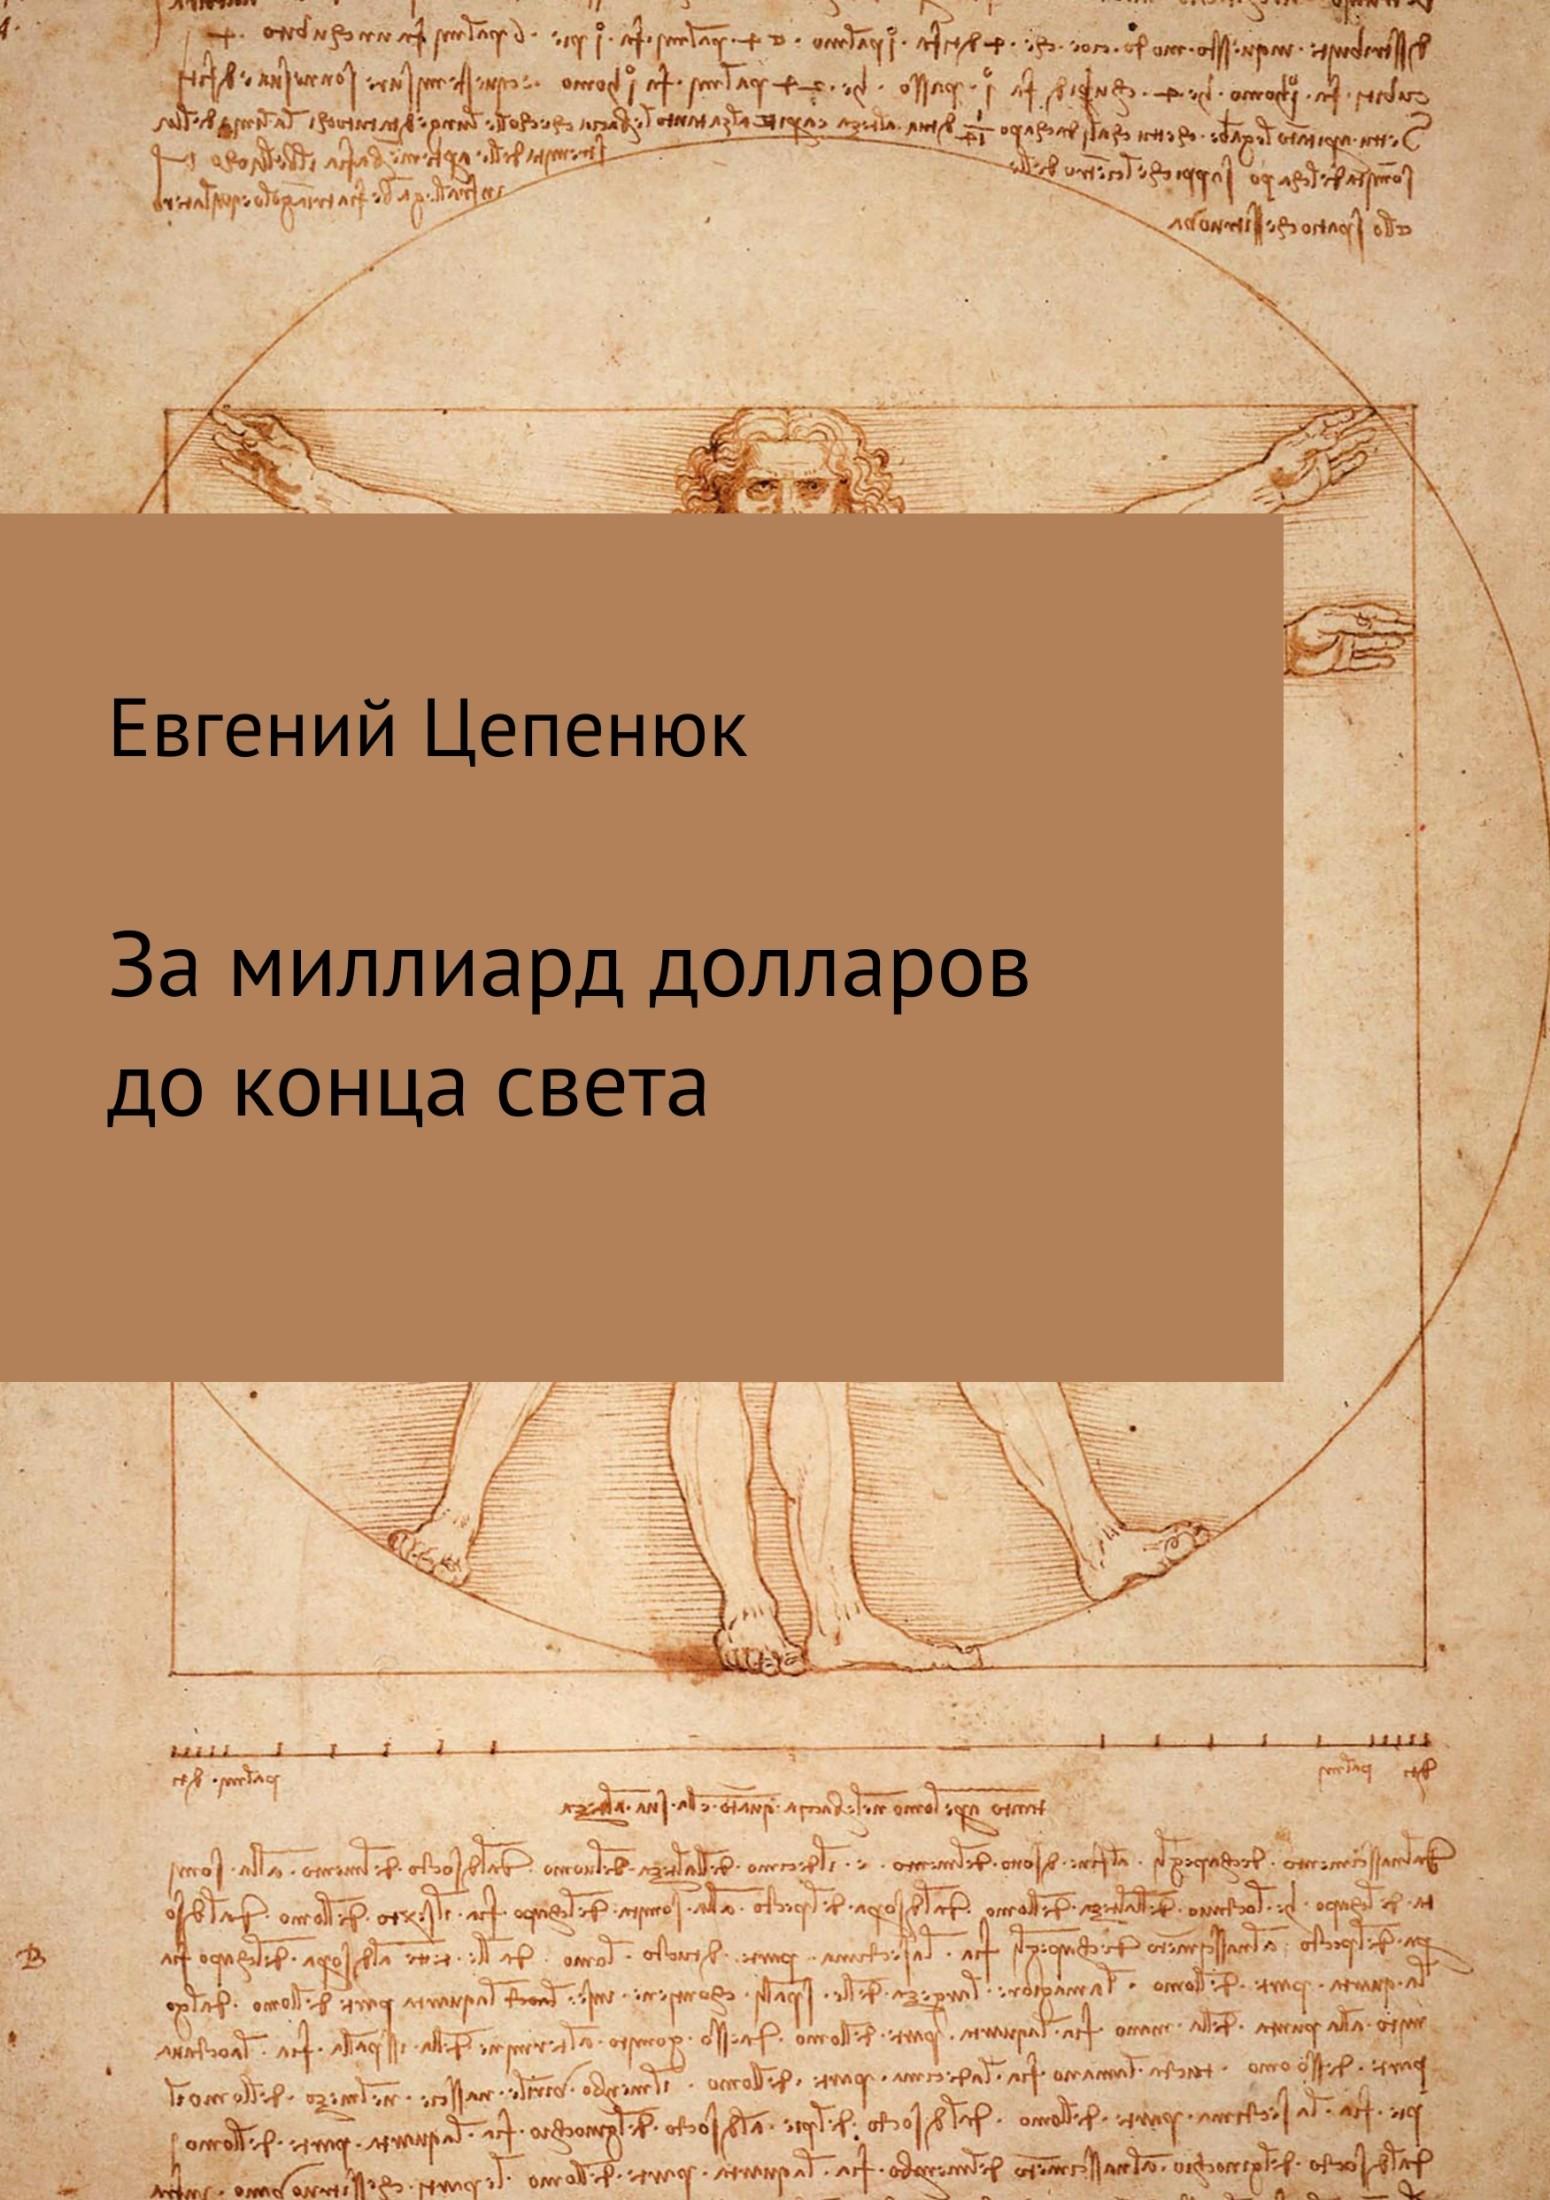 Евгений Павлович Цепенюк бесплатно